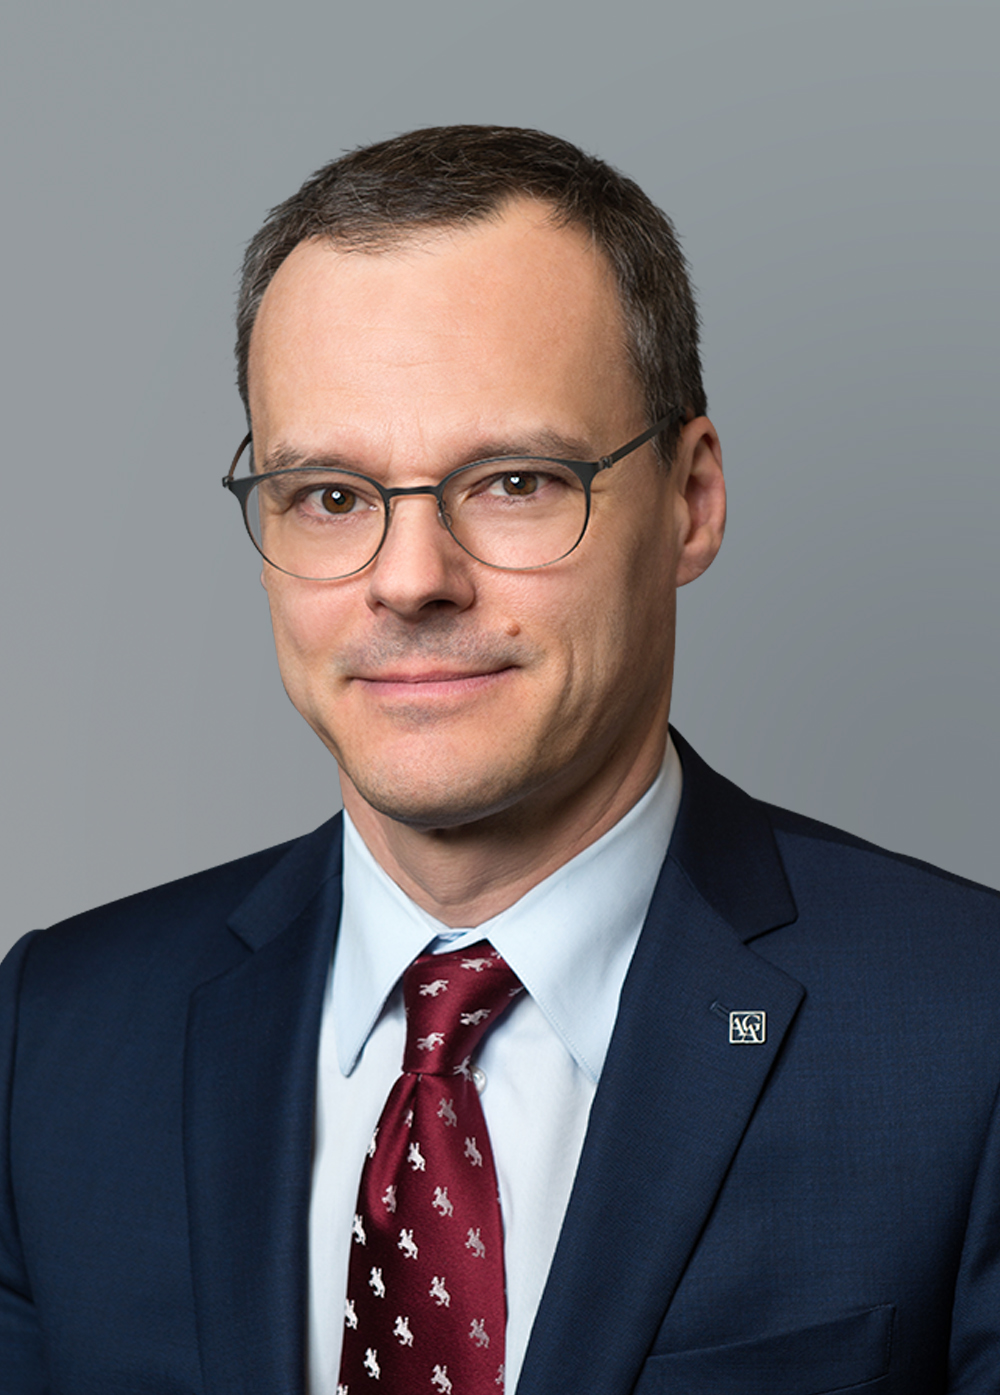 Martin Papillon, FSC, FICA, MBA